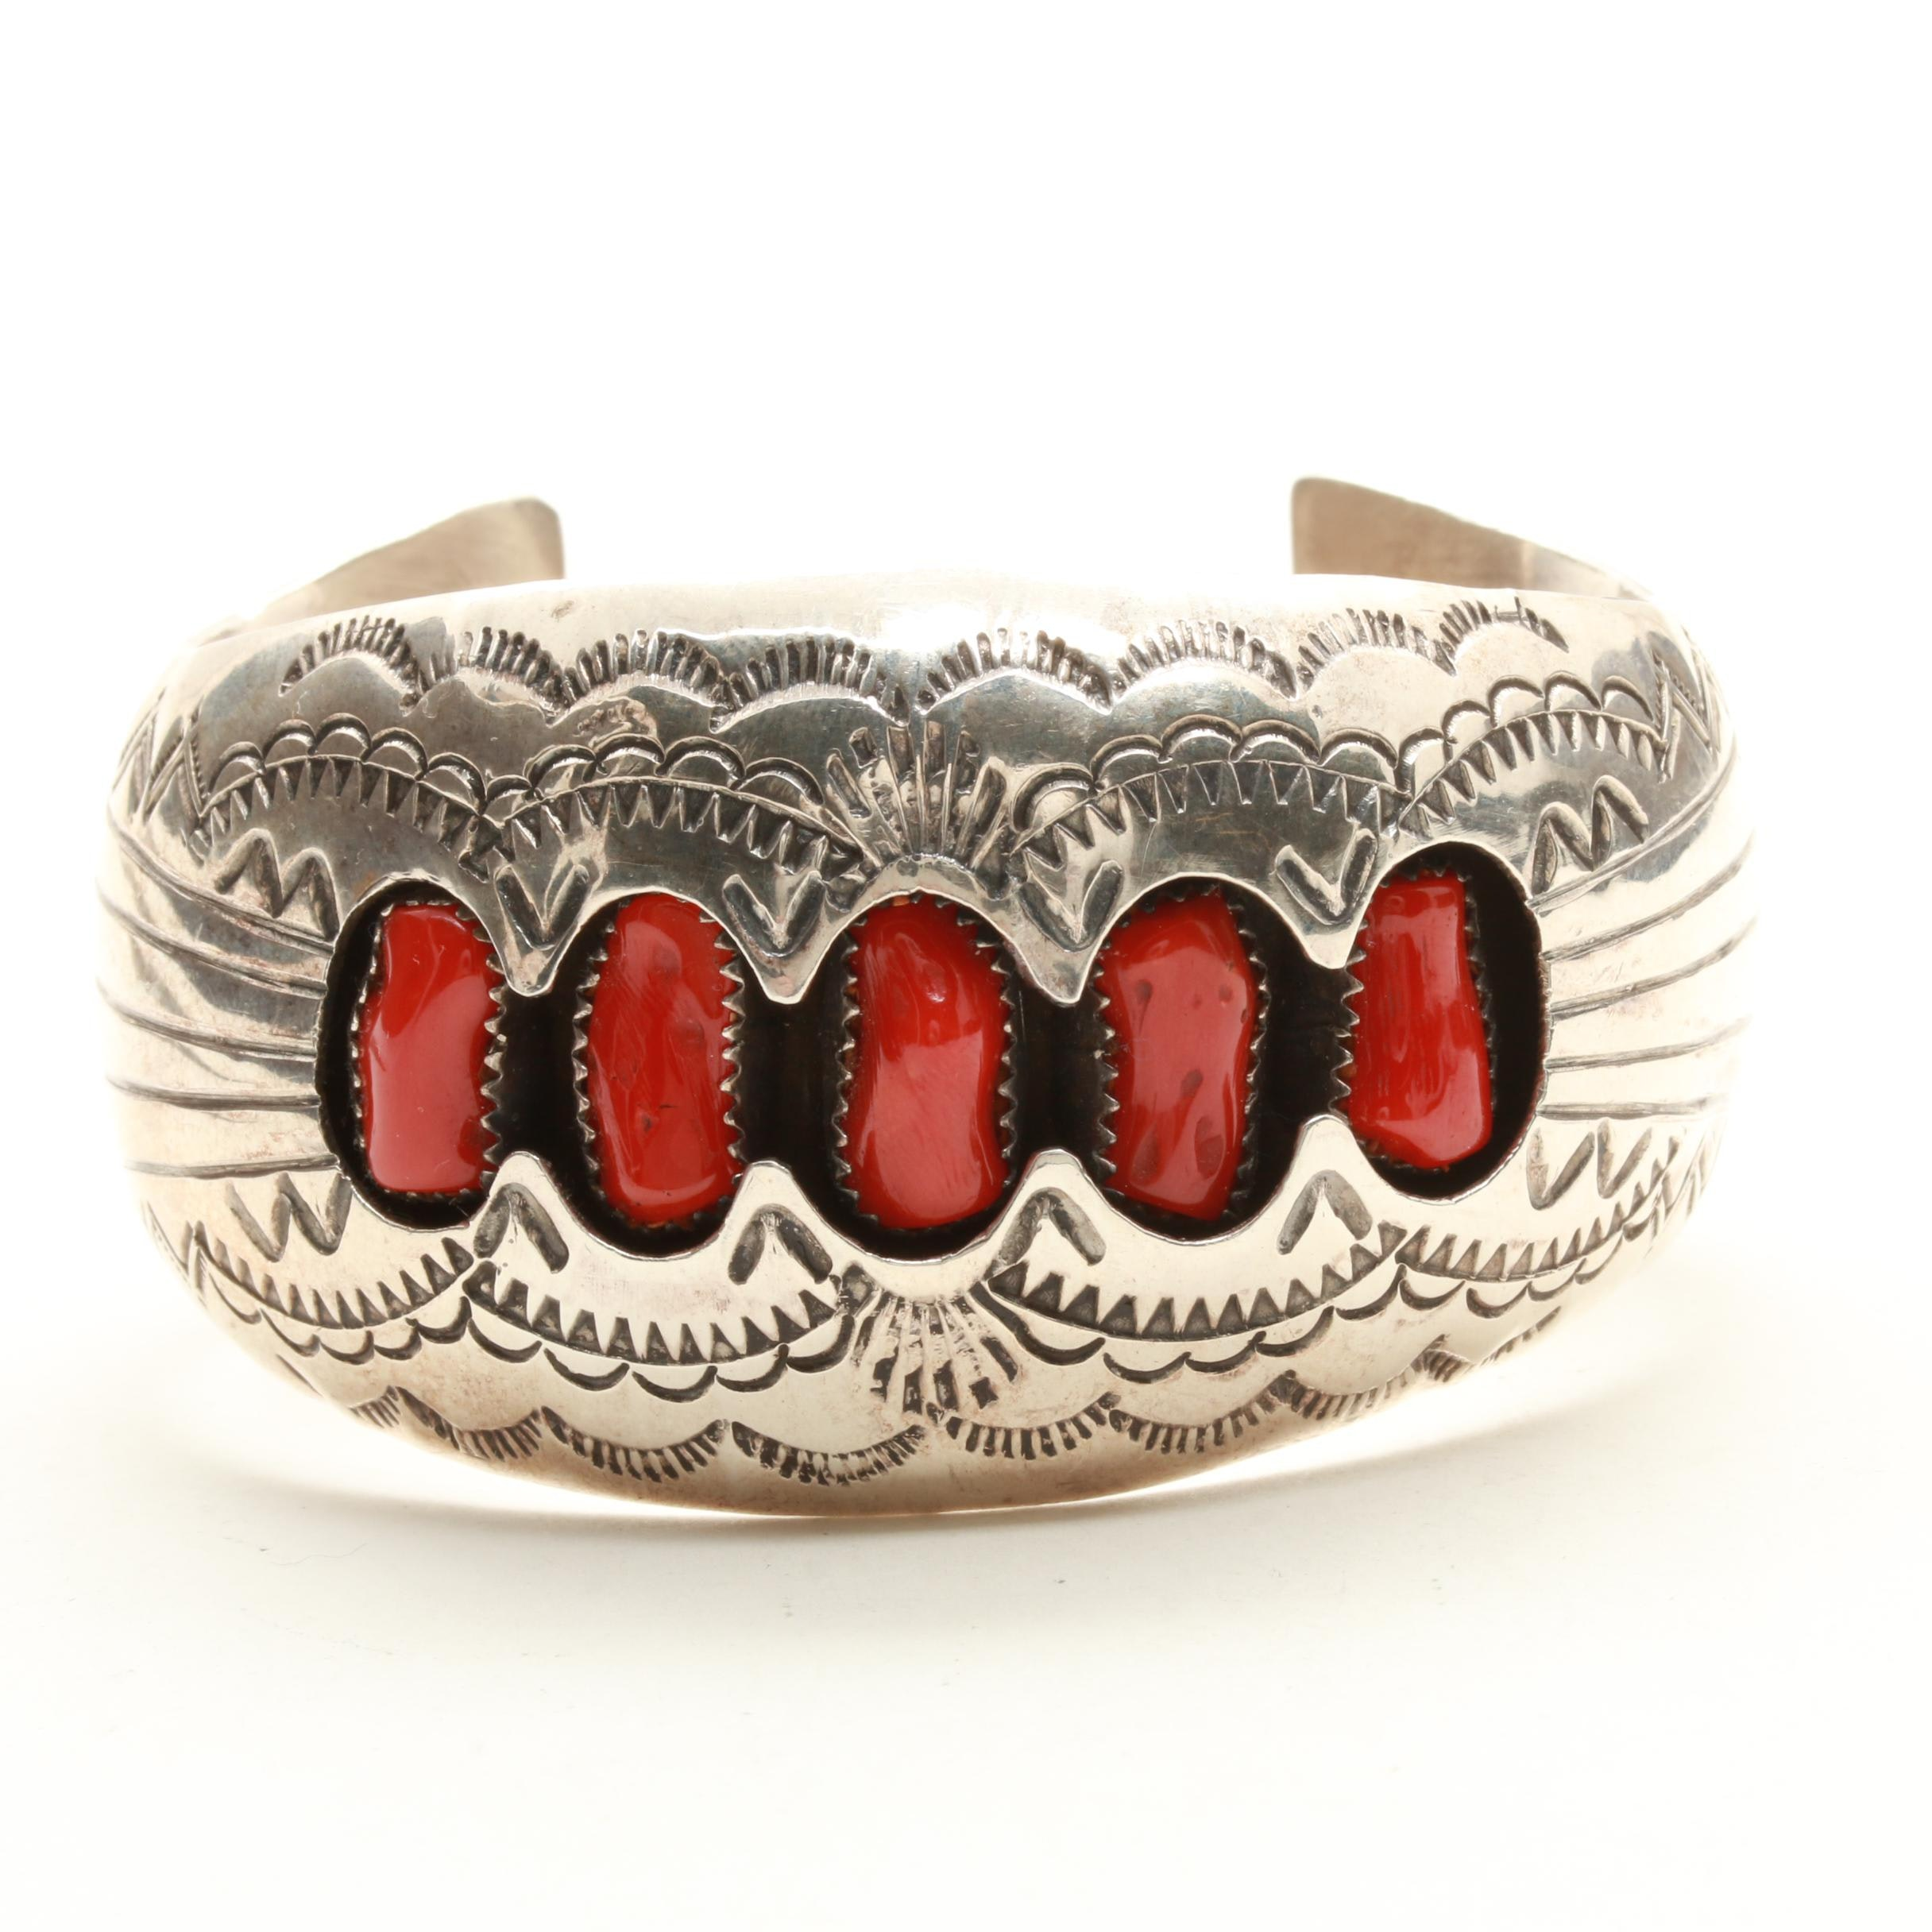 P. Benally Navajo Diné Sterling Silver Shadowbox Coral Cuff Bracelet